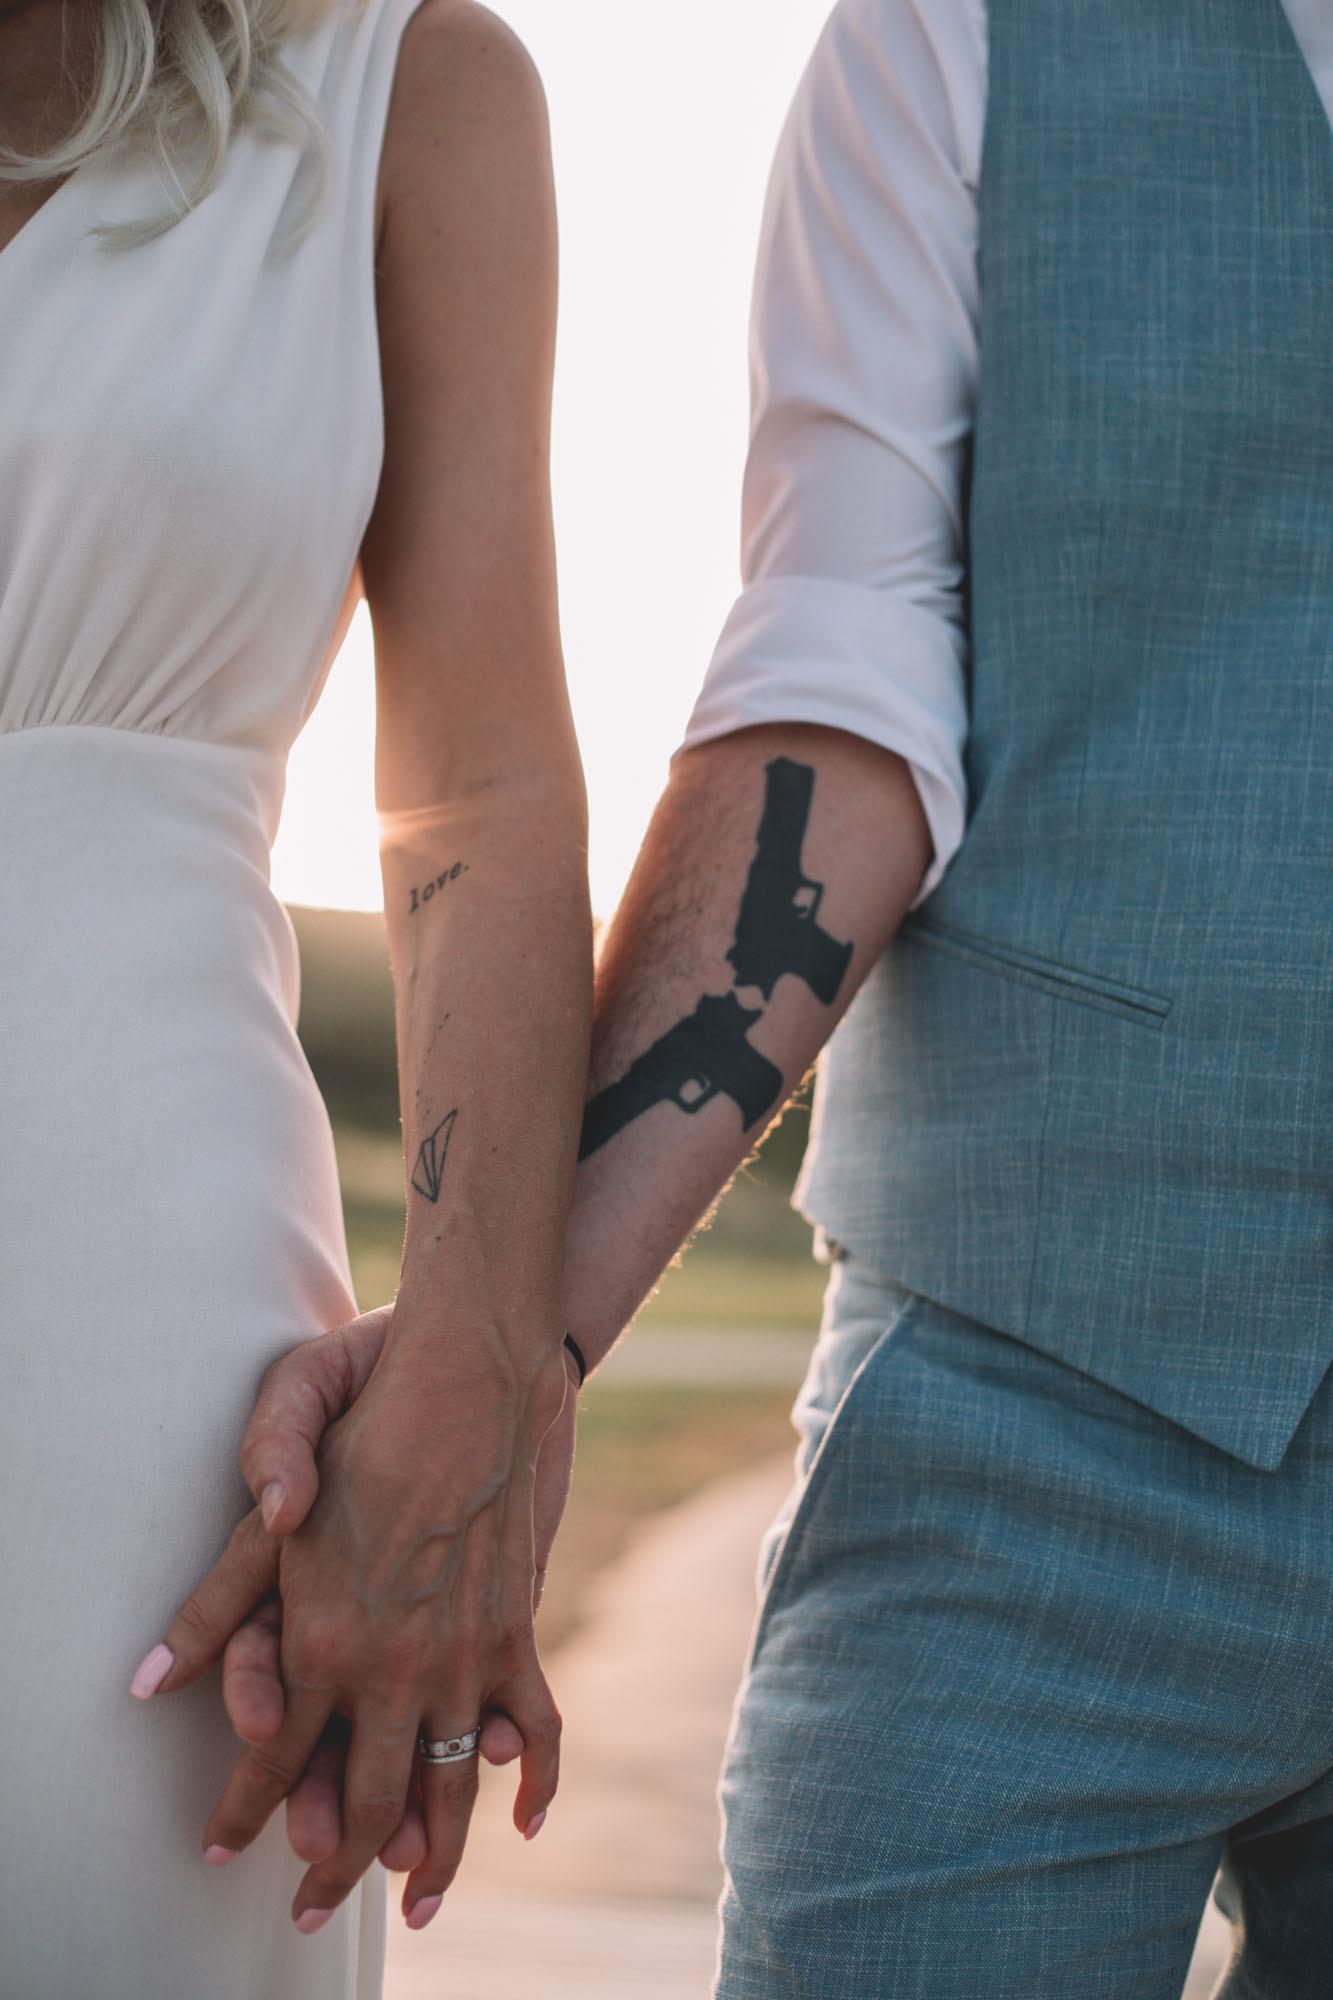 SANDDY + SIMON_DOMAINE DE PATRAS_PHOTOGRAPHE_MARIAGE_LES BANDITS-11